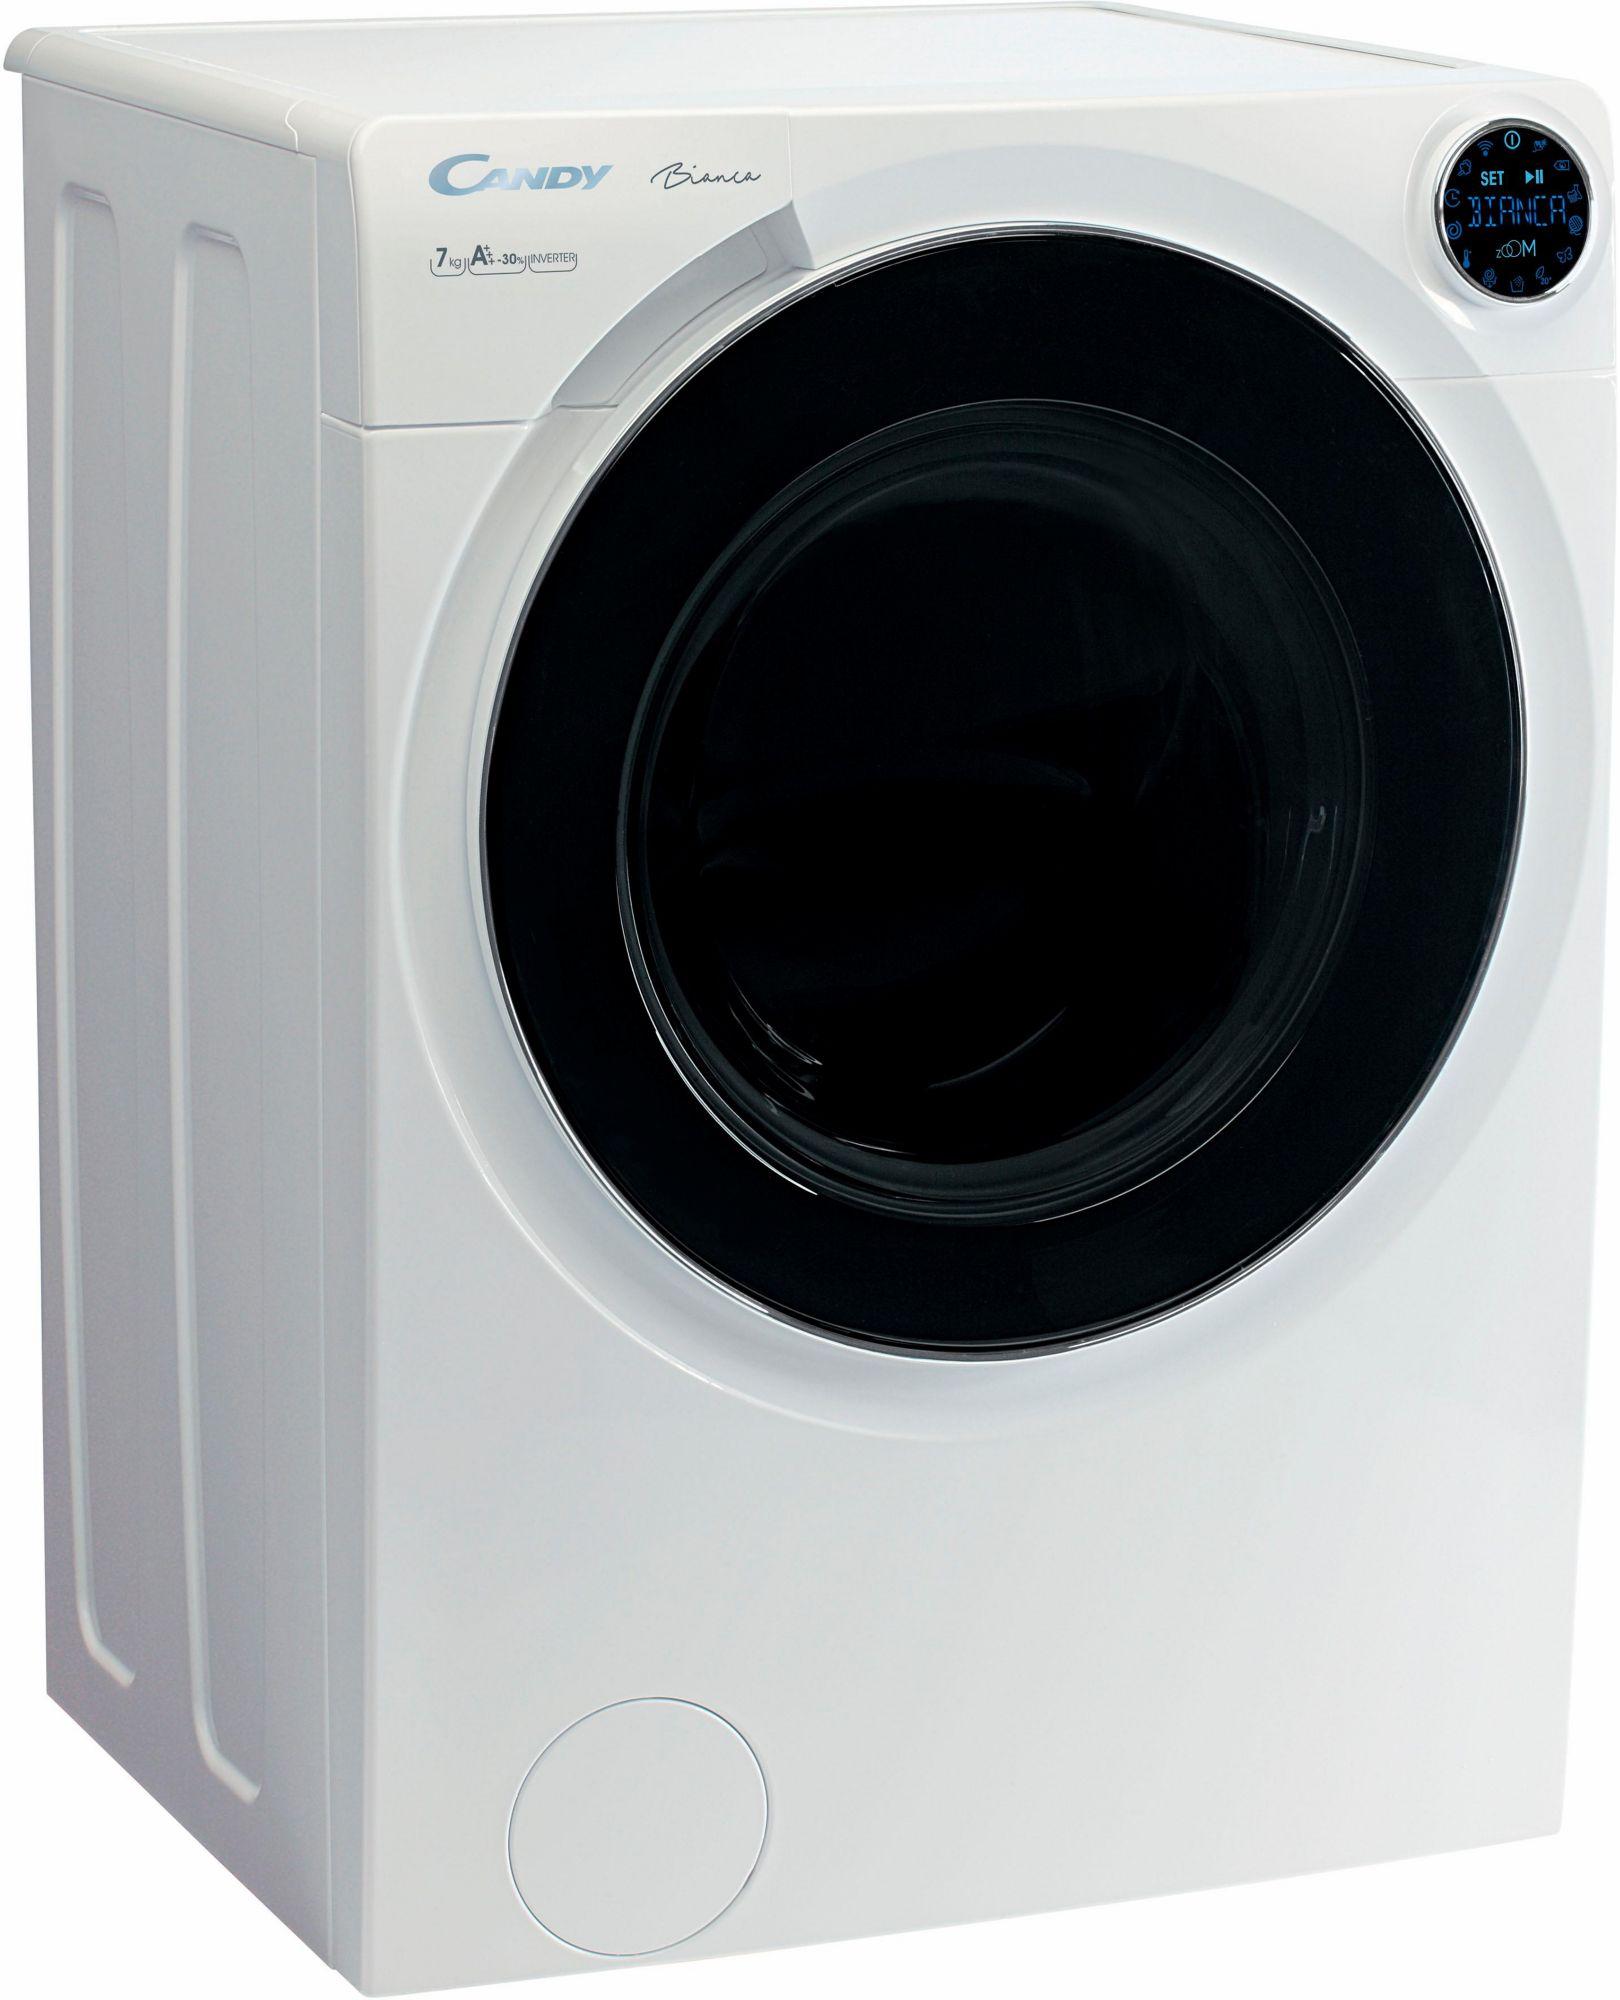 Candy Waschmaschine BWM4 137PH6/1 S, A+++, 7 Kg, 1300 U/Min